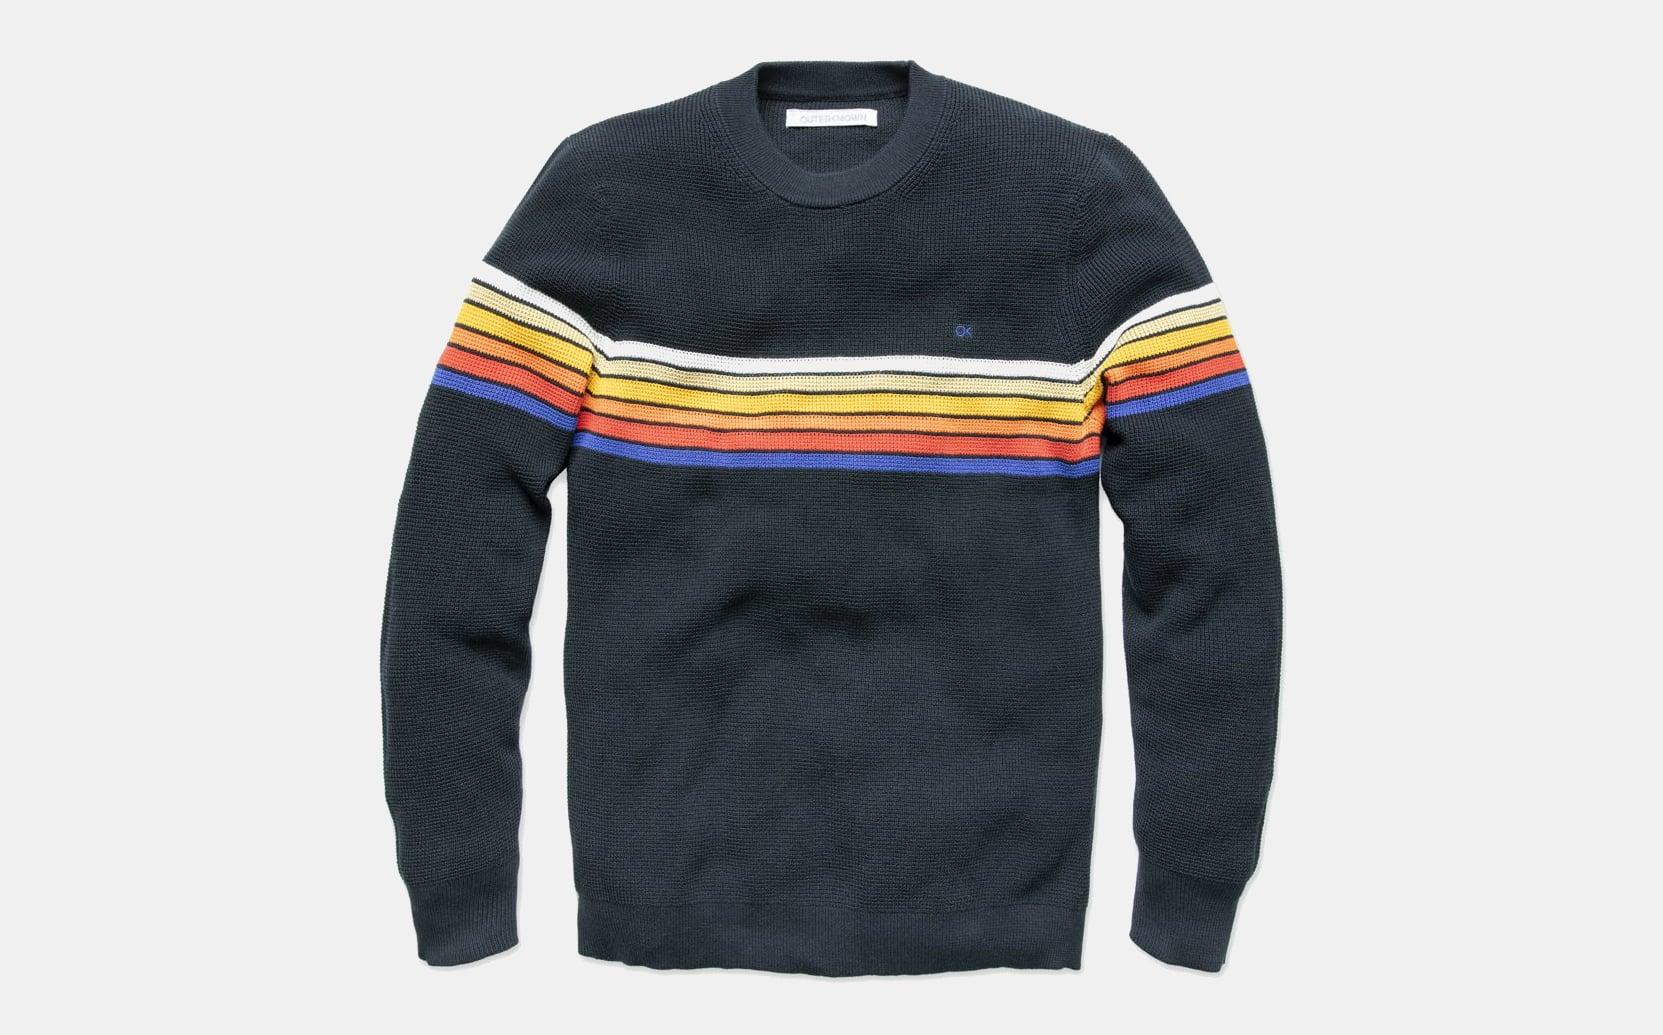 Outerknown Nostalgic Sweater